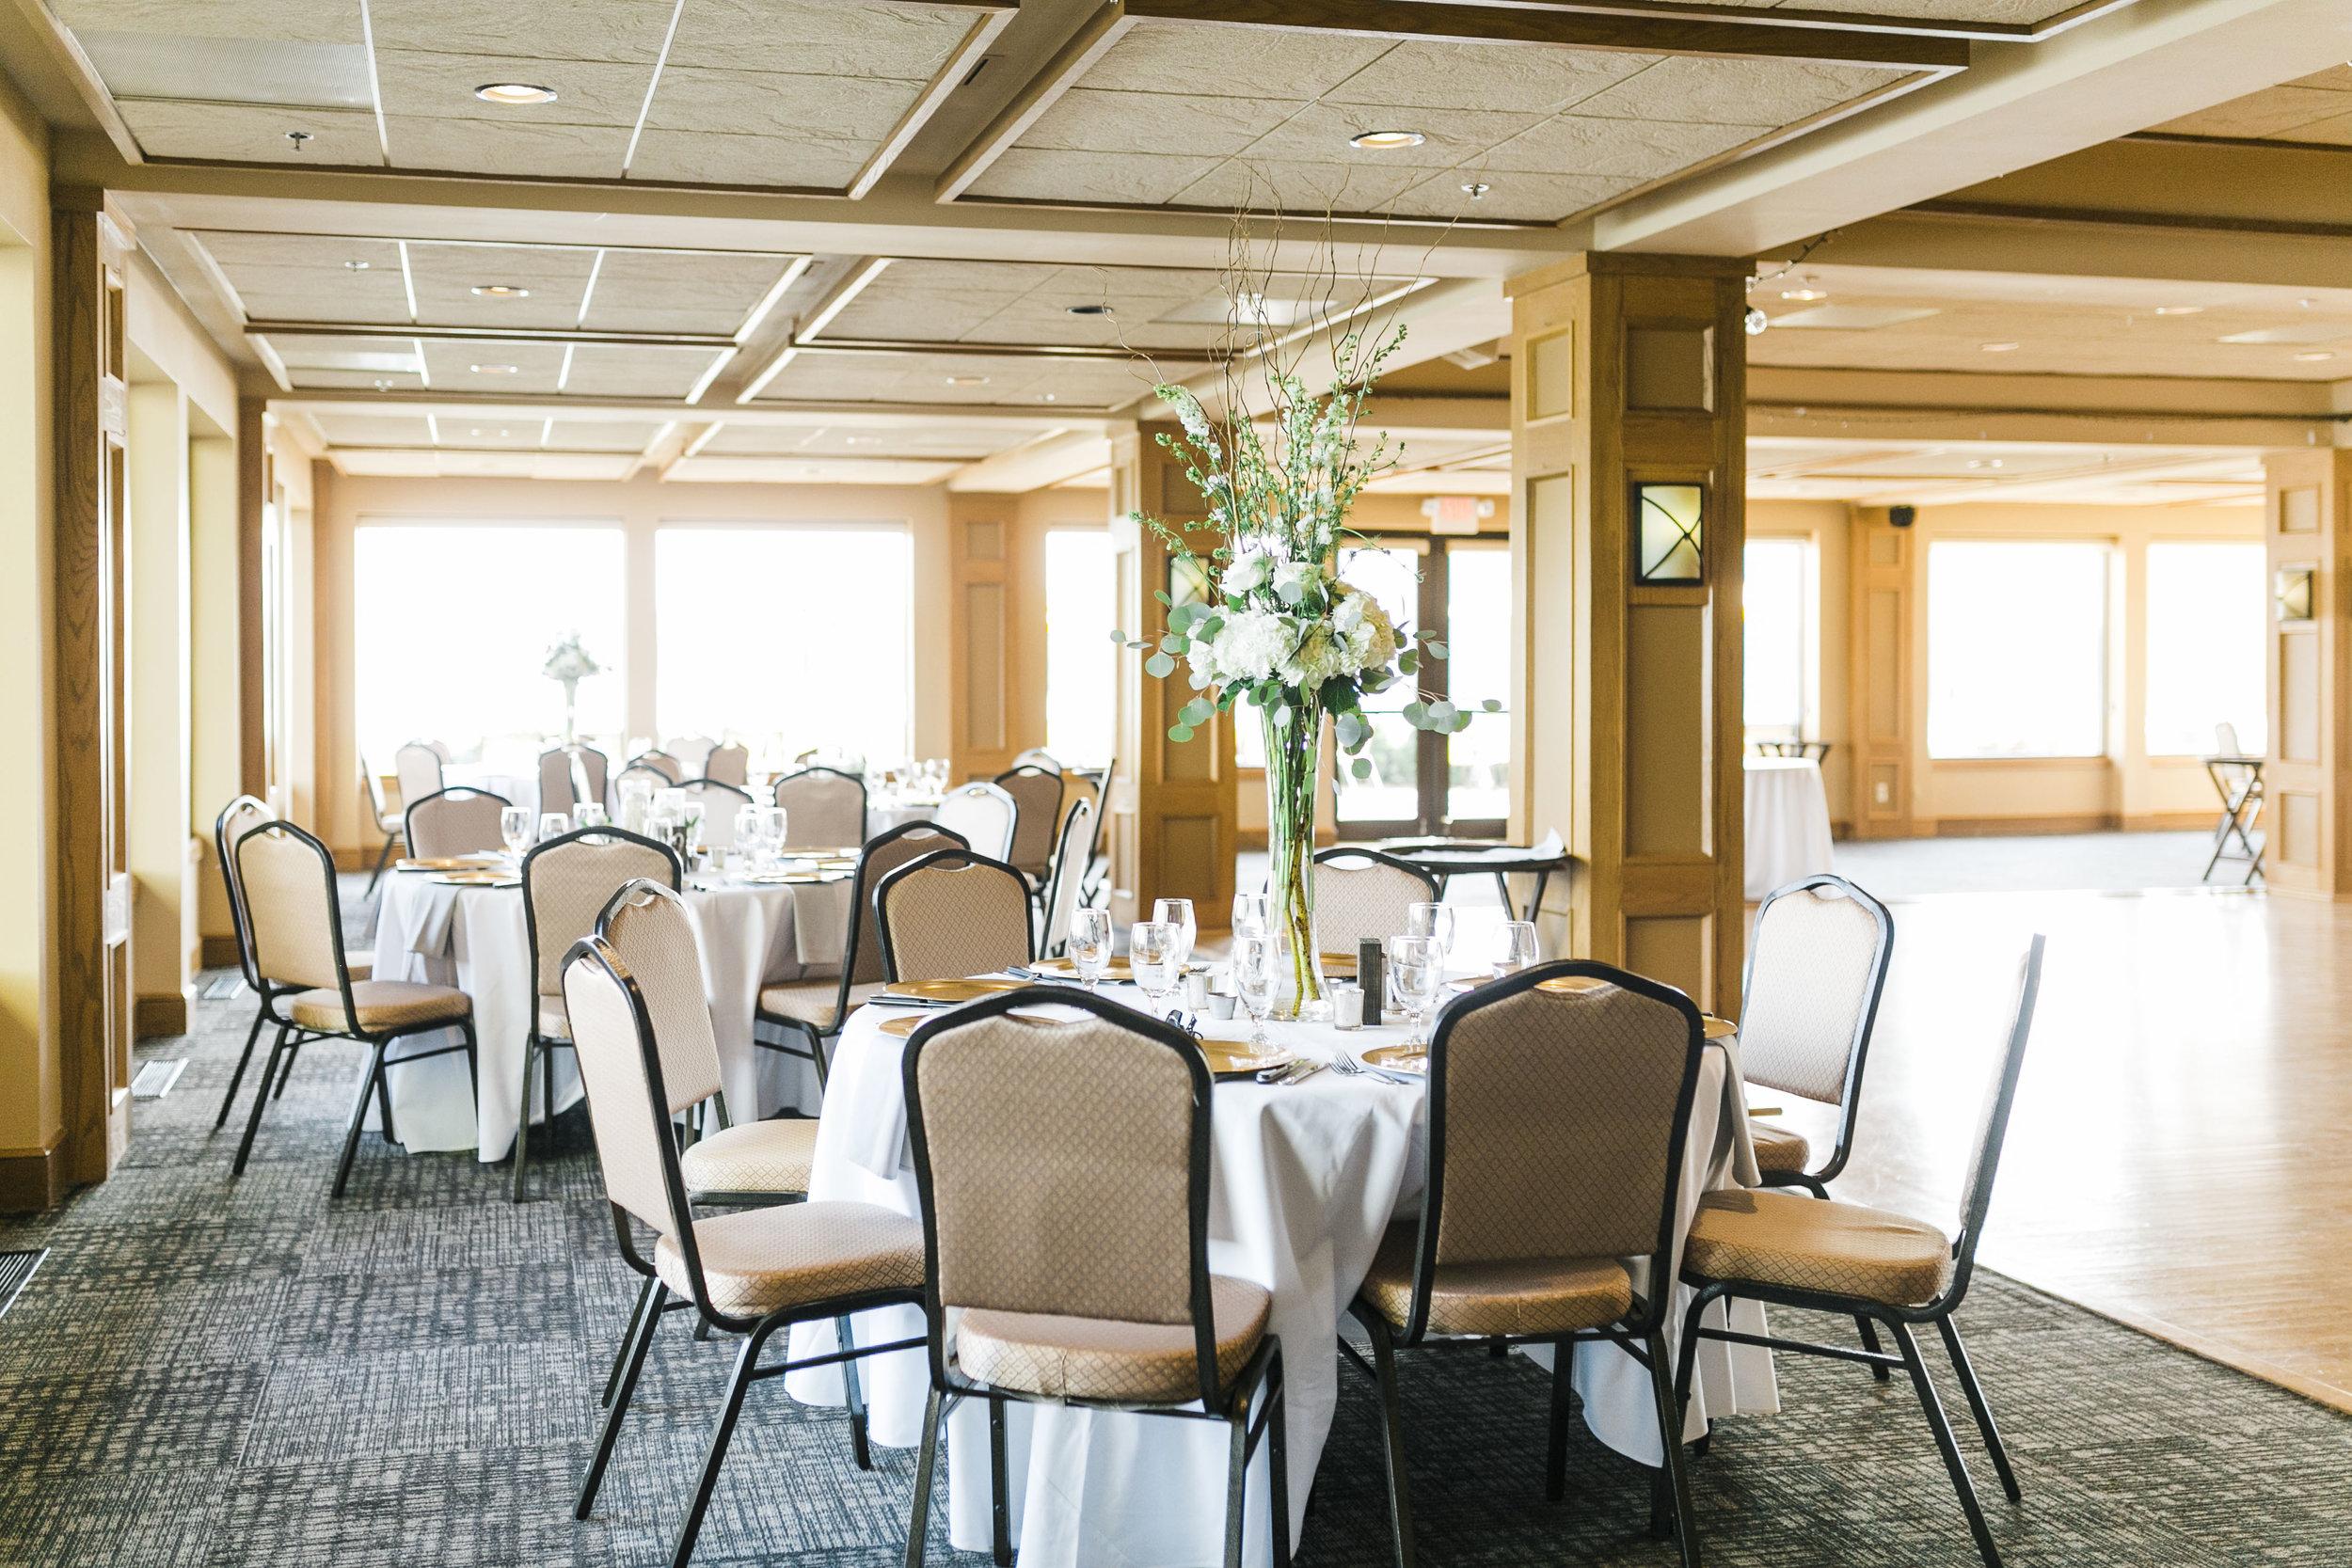 tellico village yacht club wedding indoor ballroom knoxville